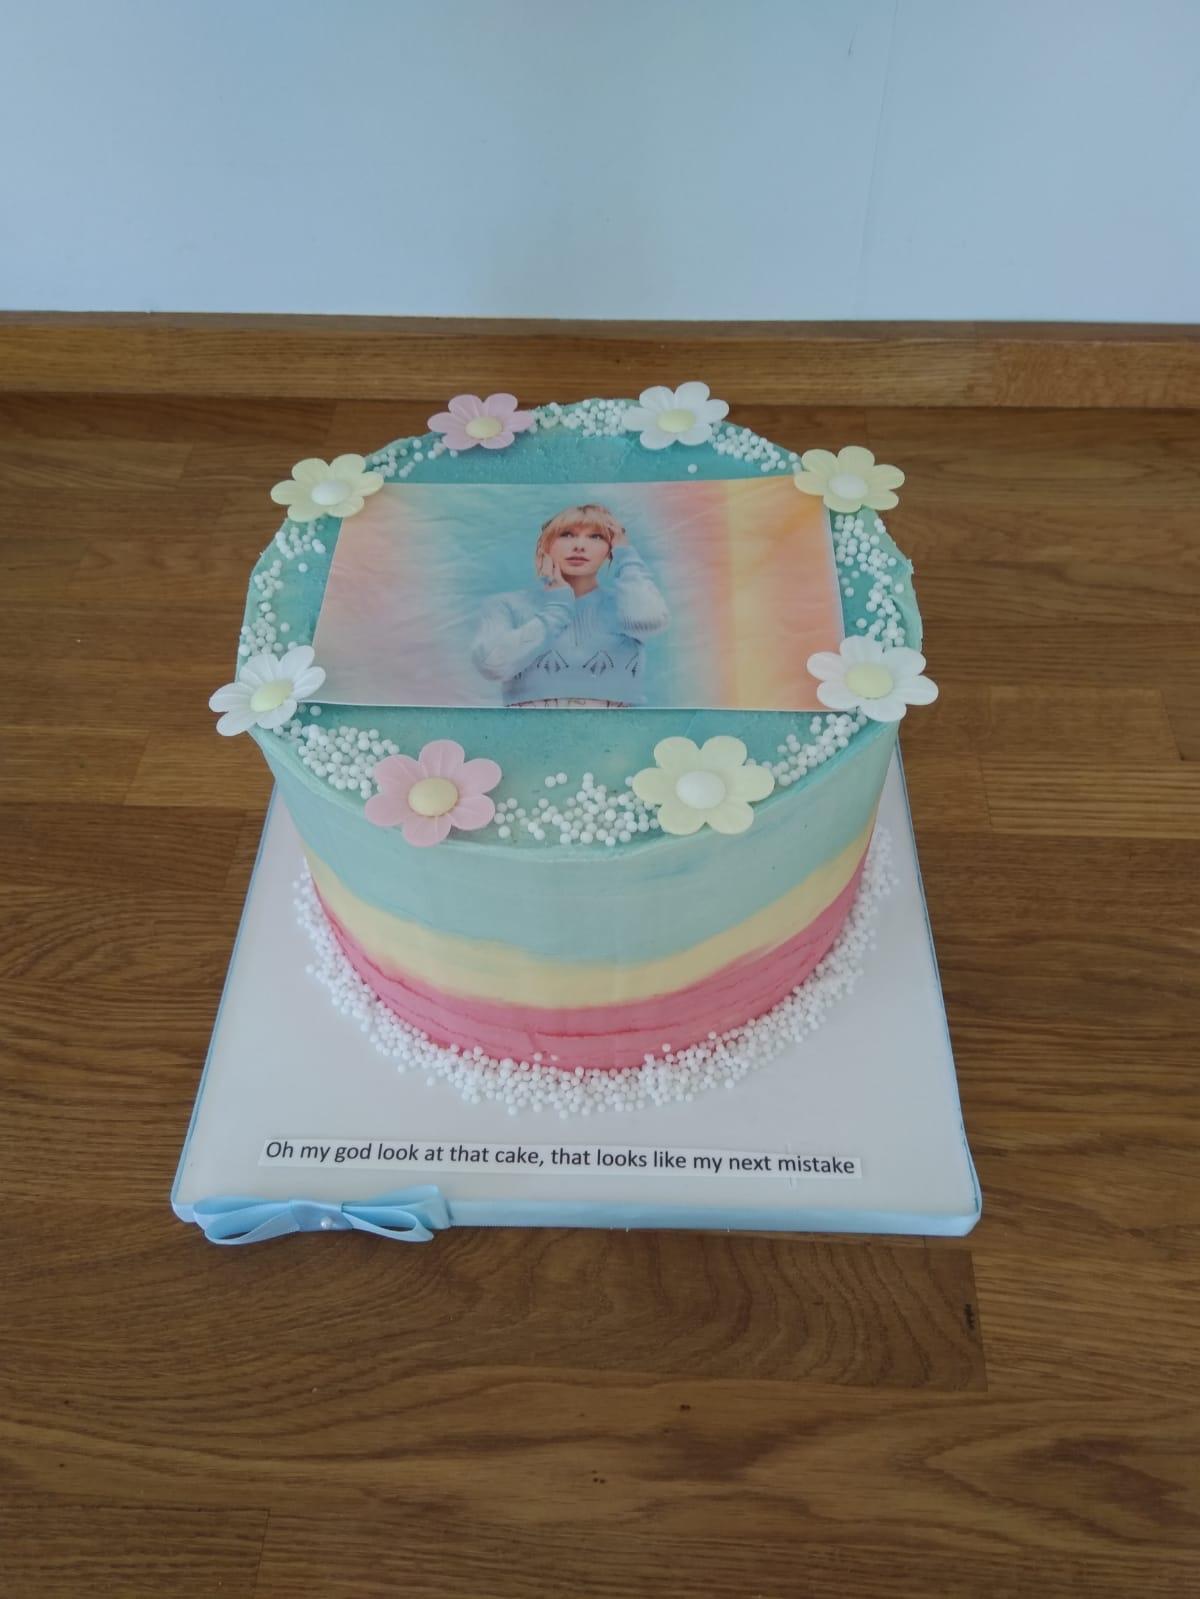 Pleasing Happy Birthday To The Best Friend Of Me Taylor Swift Theories Funny Birthday Cards Online Elaedamsfinfo